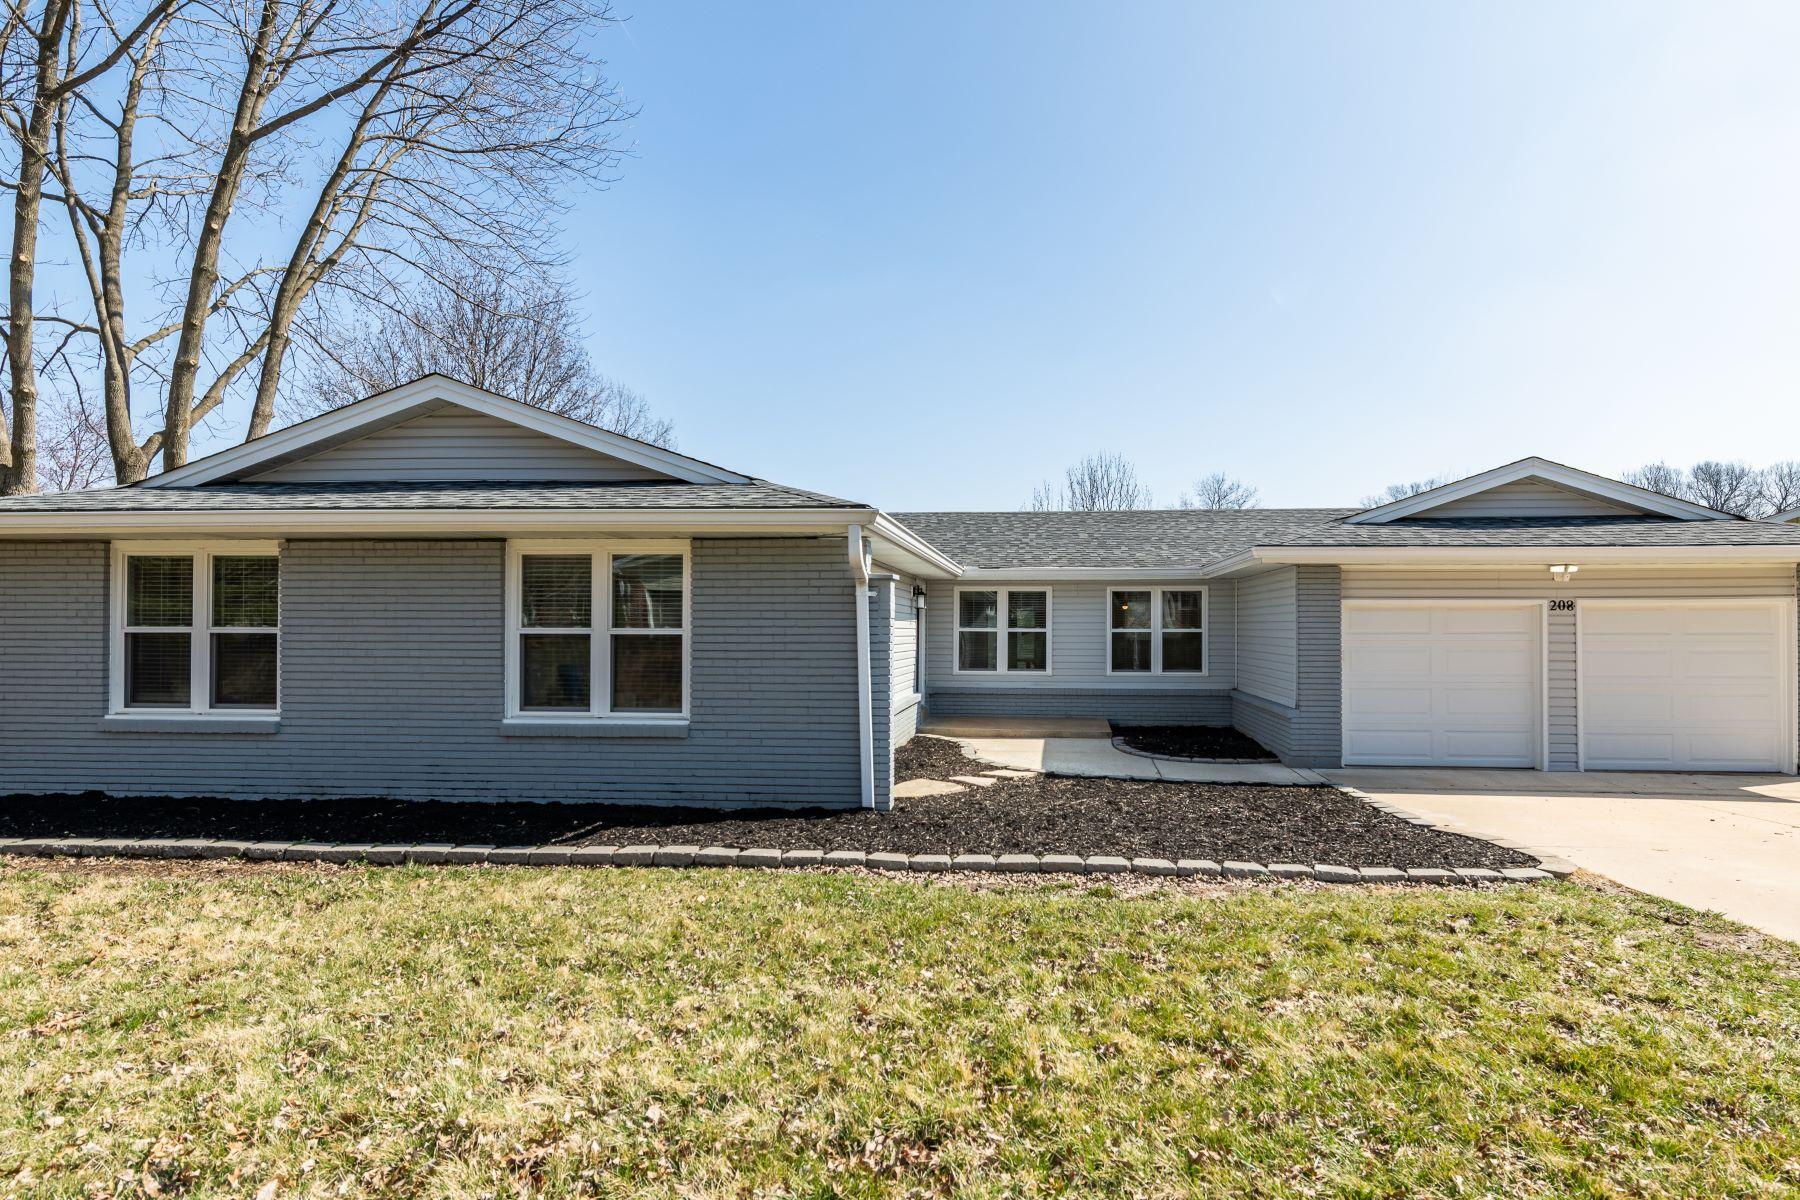 Single Family Homes für Verkauf beim Sophisticated Living in Ballwin! 208 Spooners Mill Drive, Ballwin, Missouri 63011 Vereinigte Staaten